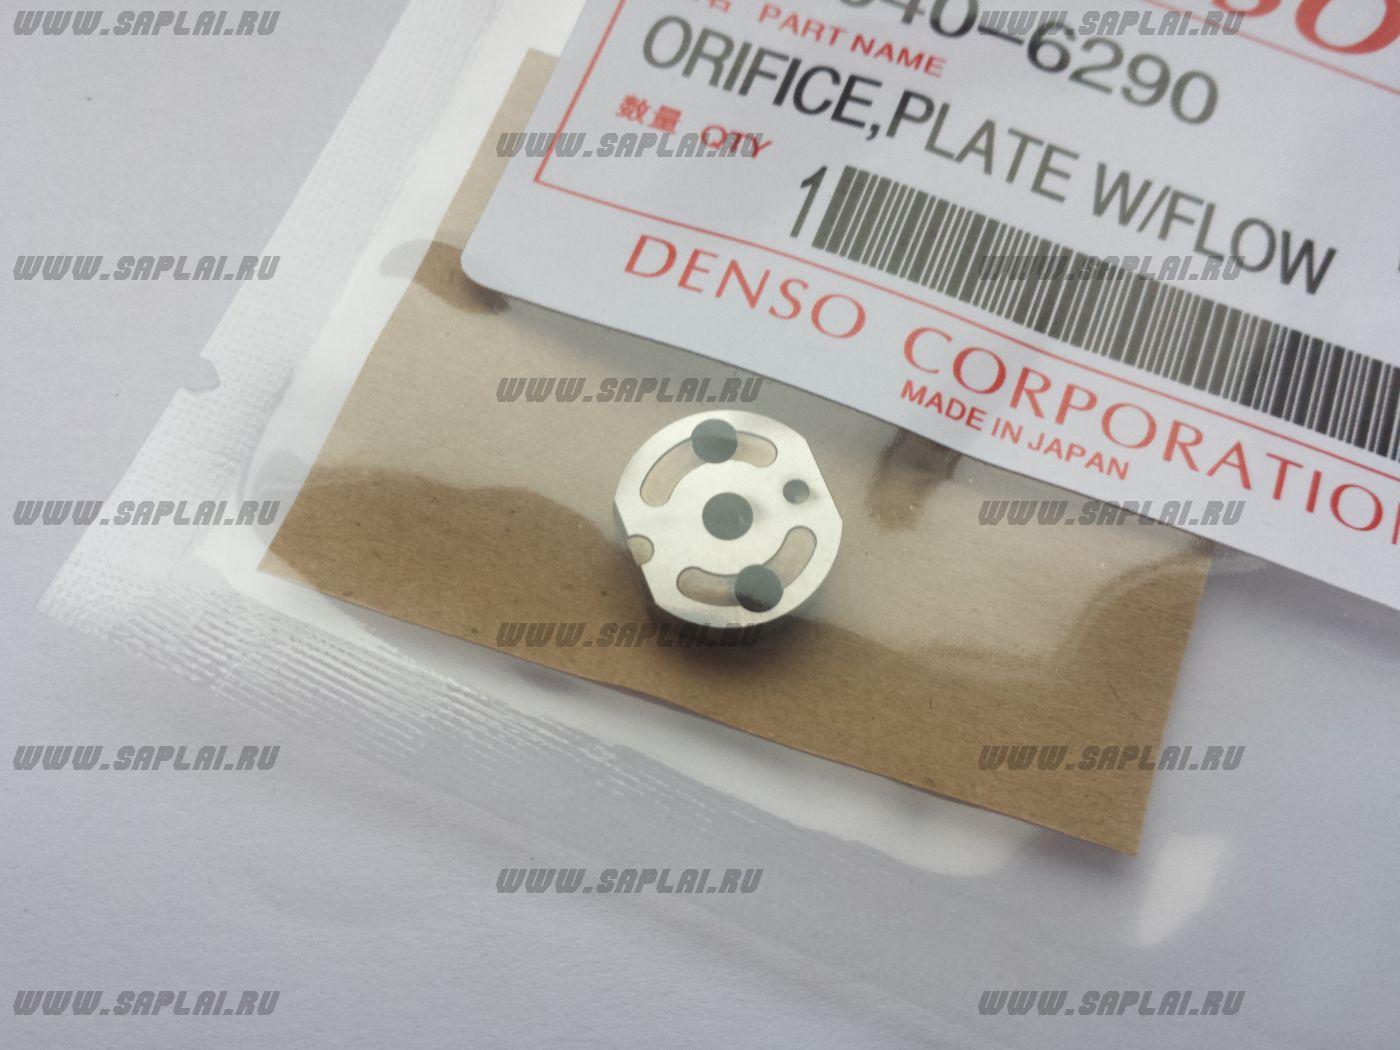 Клапан мембрана DENSO (оригинал) для форсунки 095000-5650 / 6240 / 6250